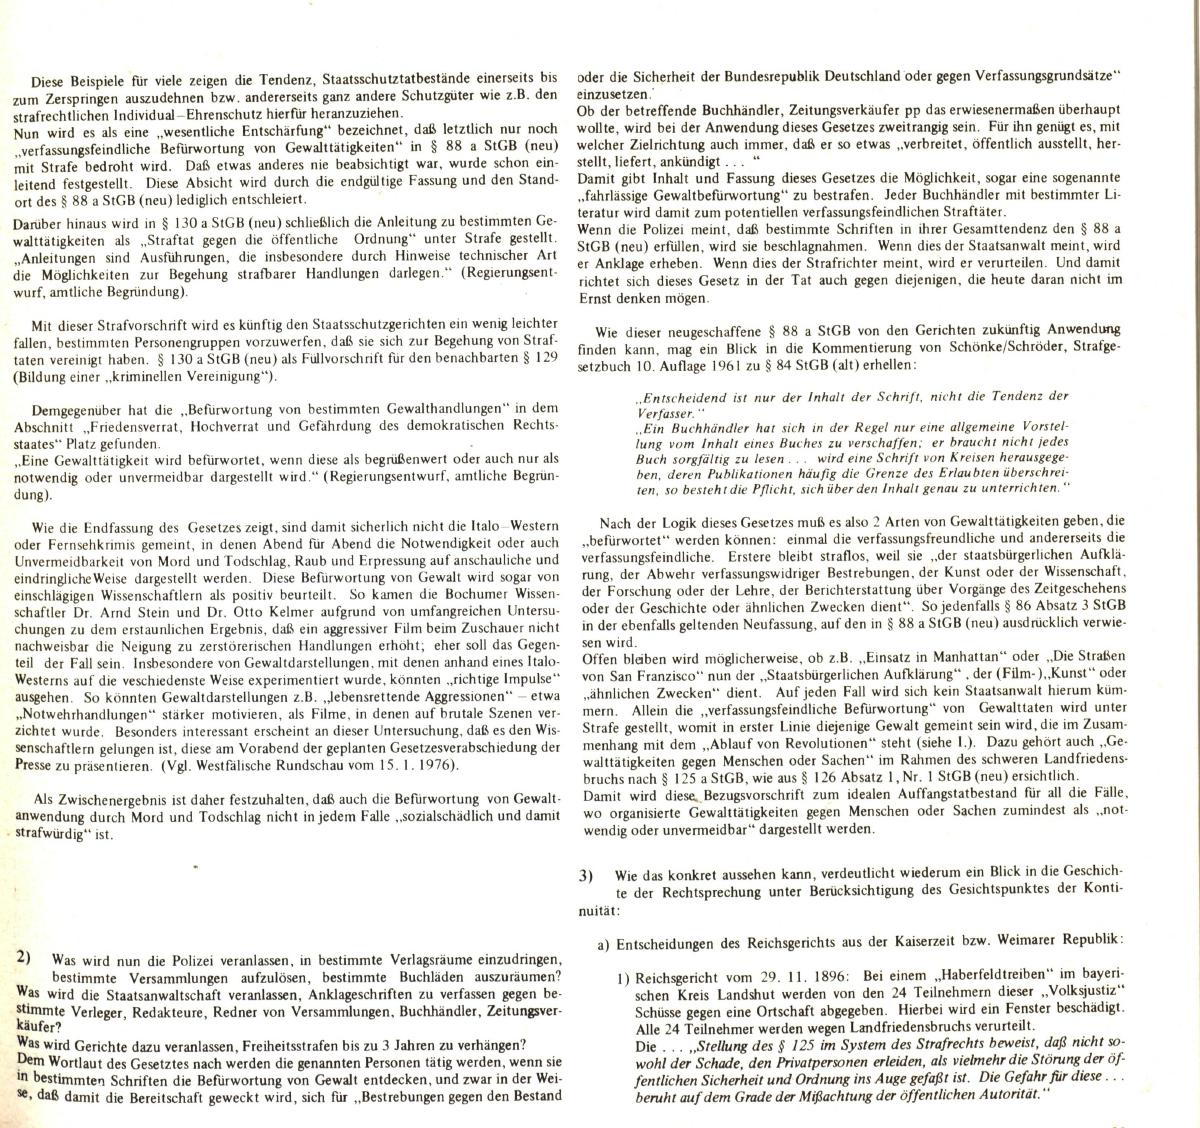 REP_VLB_1976_Die_Zensurgesetze_24